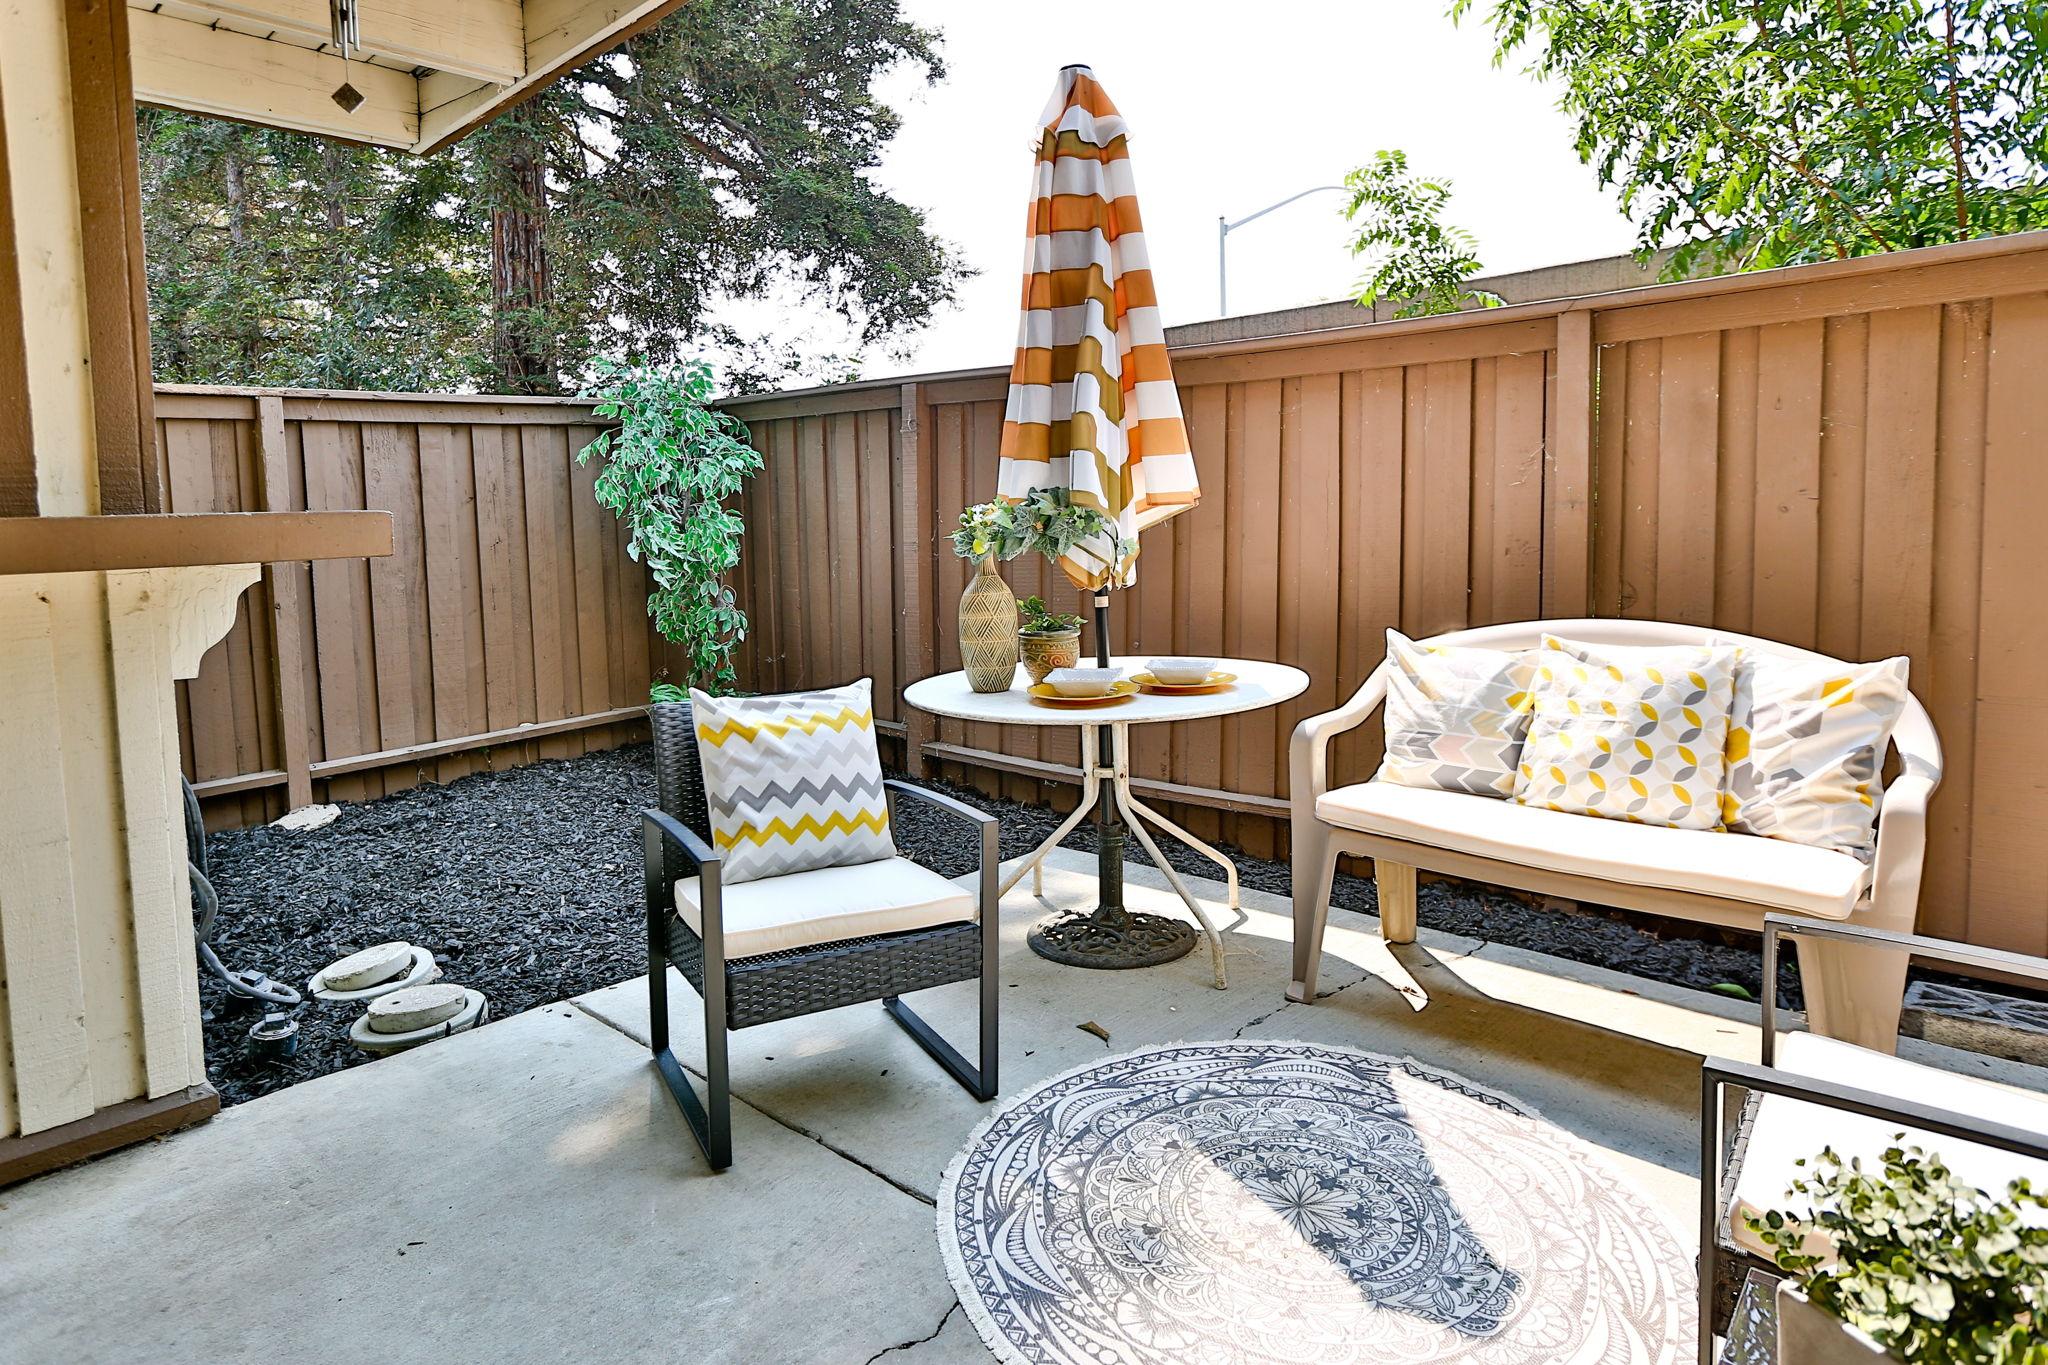 Slider to patio seating and storage closet